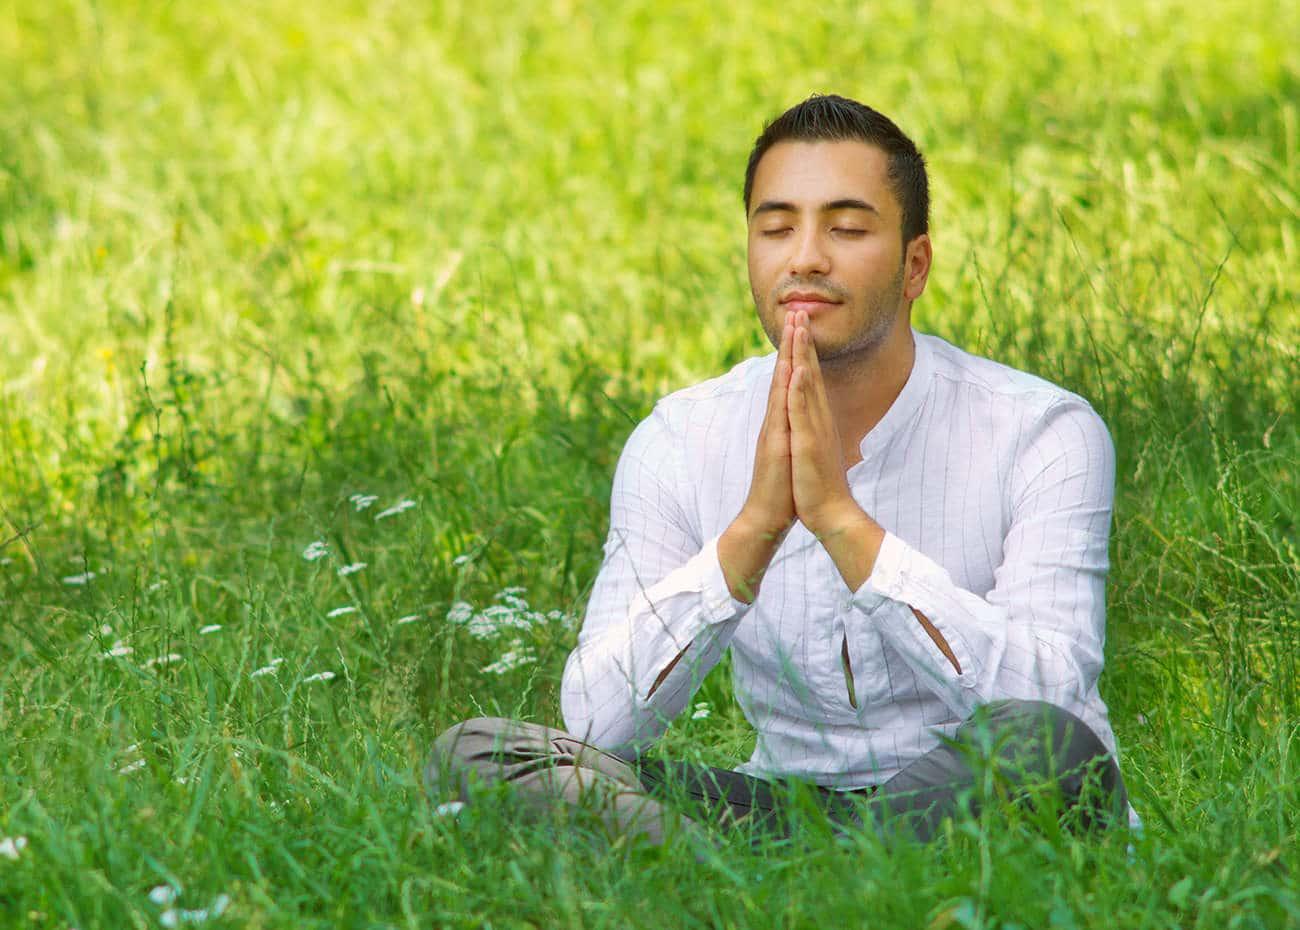 crop_therapies_stress_relief